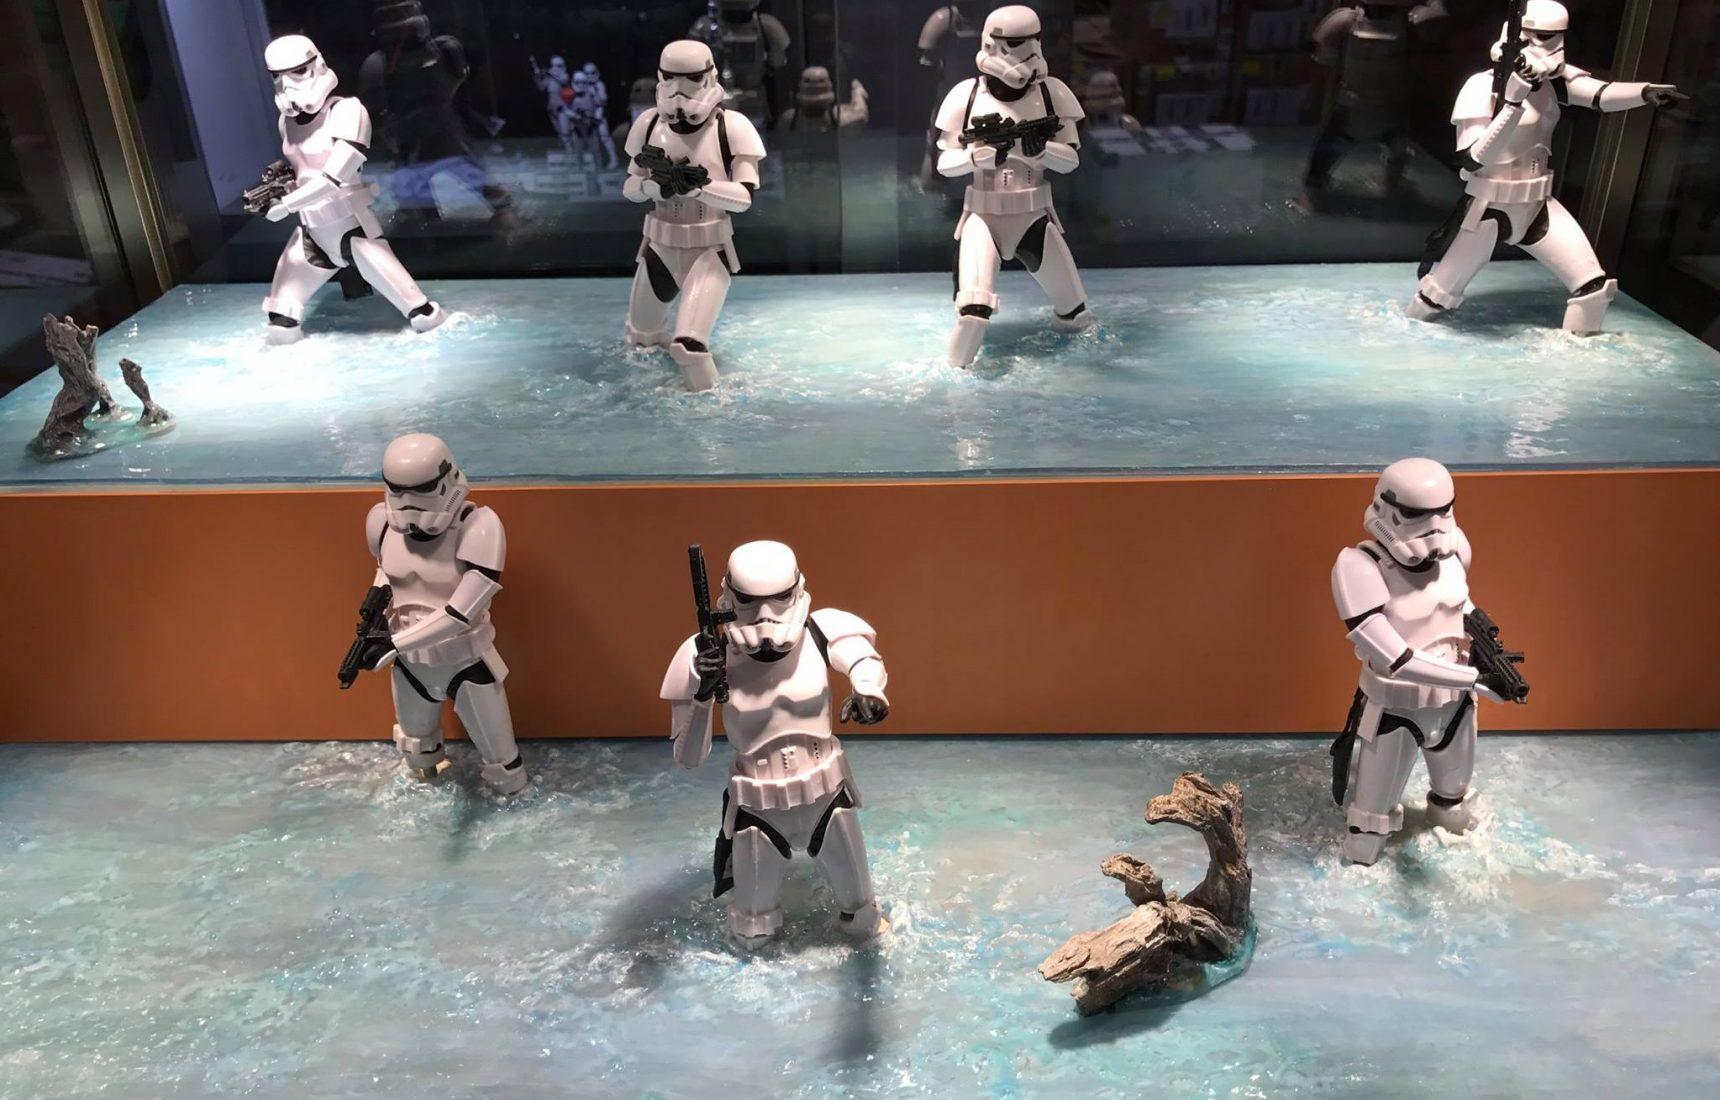 #shortcut: Kotobukiya Star Wars News von der NYCC 2016